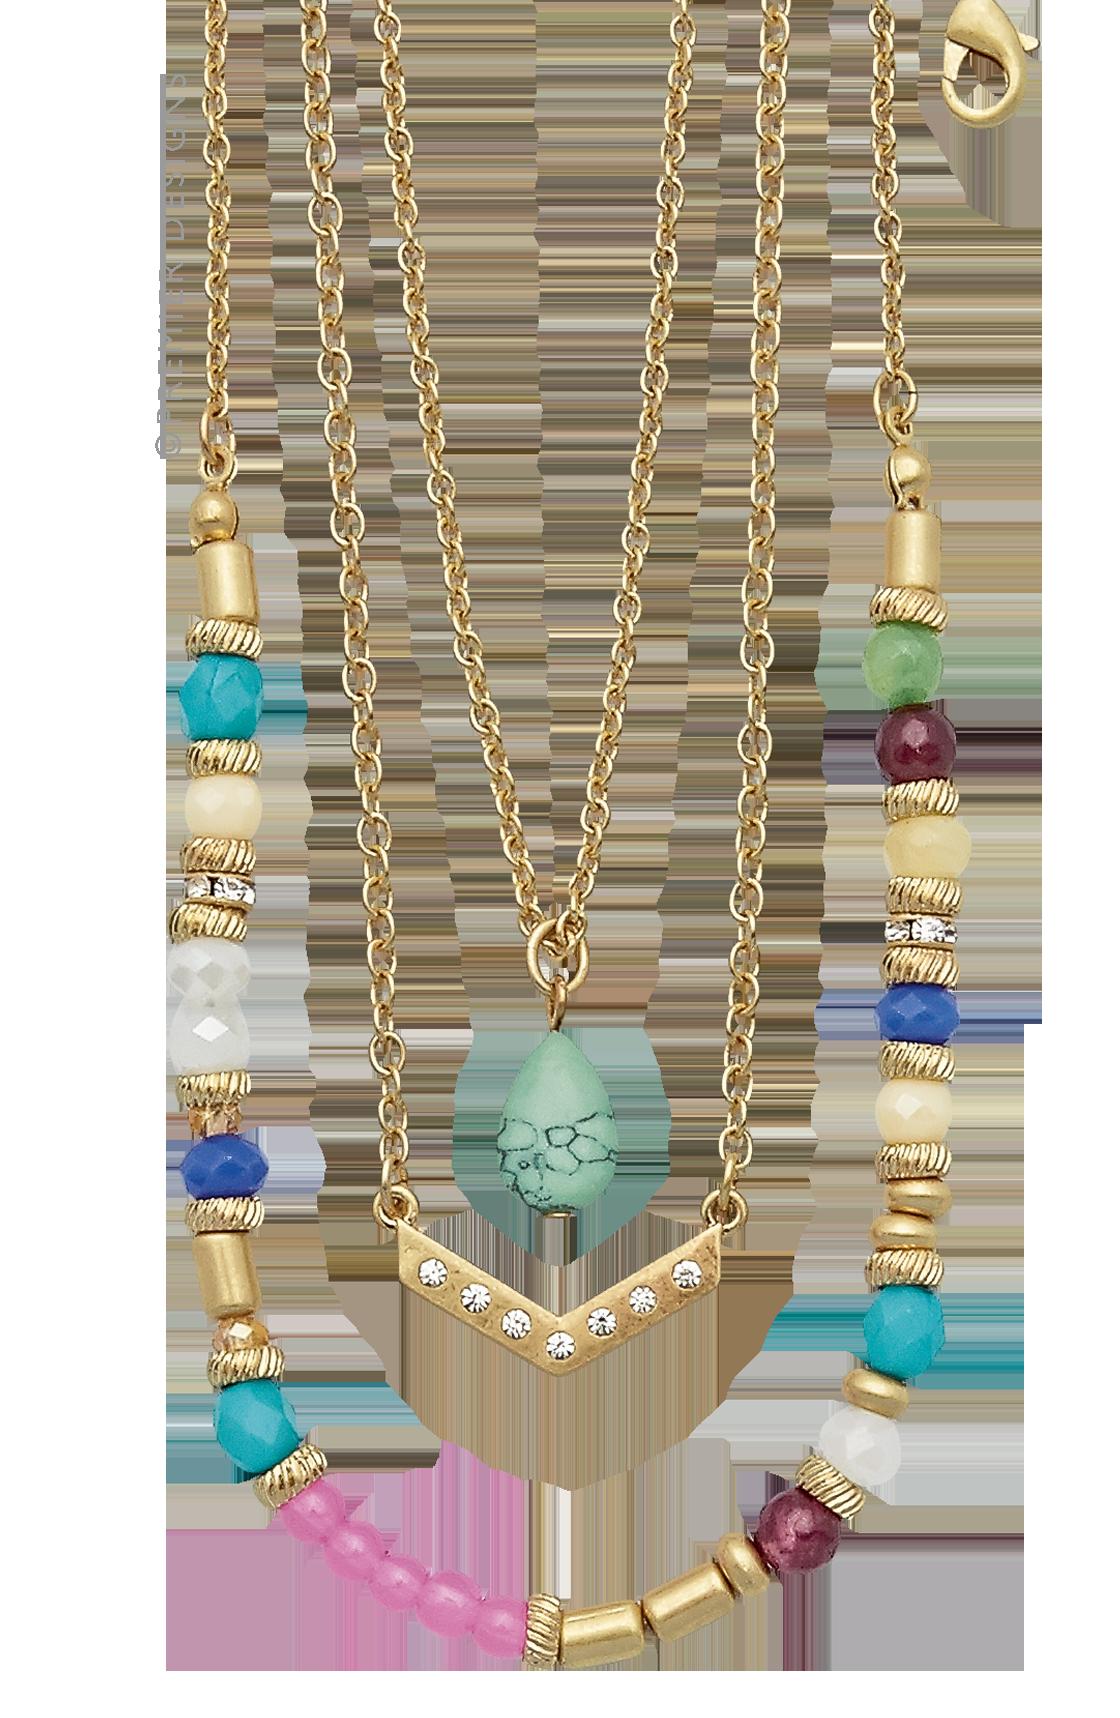 Premier designs jewelry 2015 - Rebekah Snider Premier Designs Jewelry 757 635 4949 Premier757